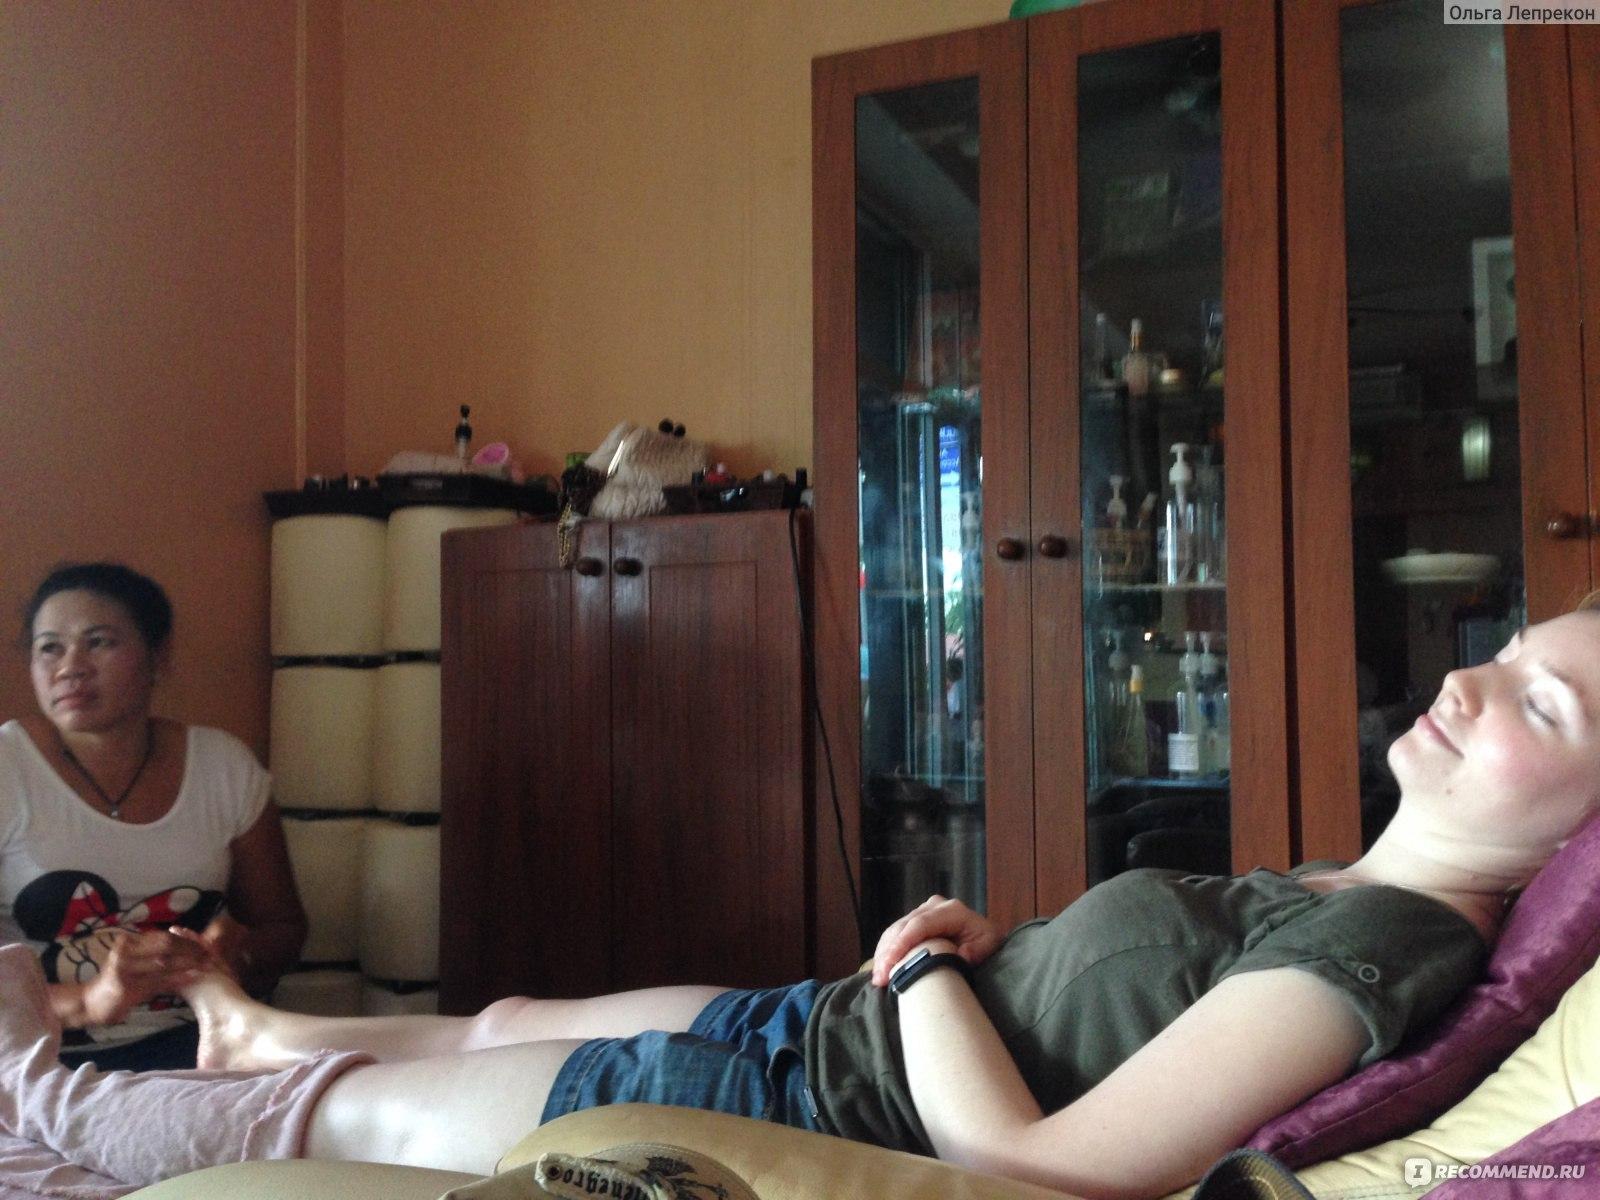 Тайки предлагают массаж для мужчин в москве